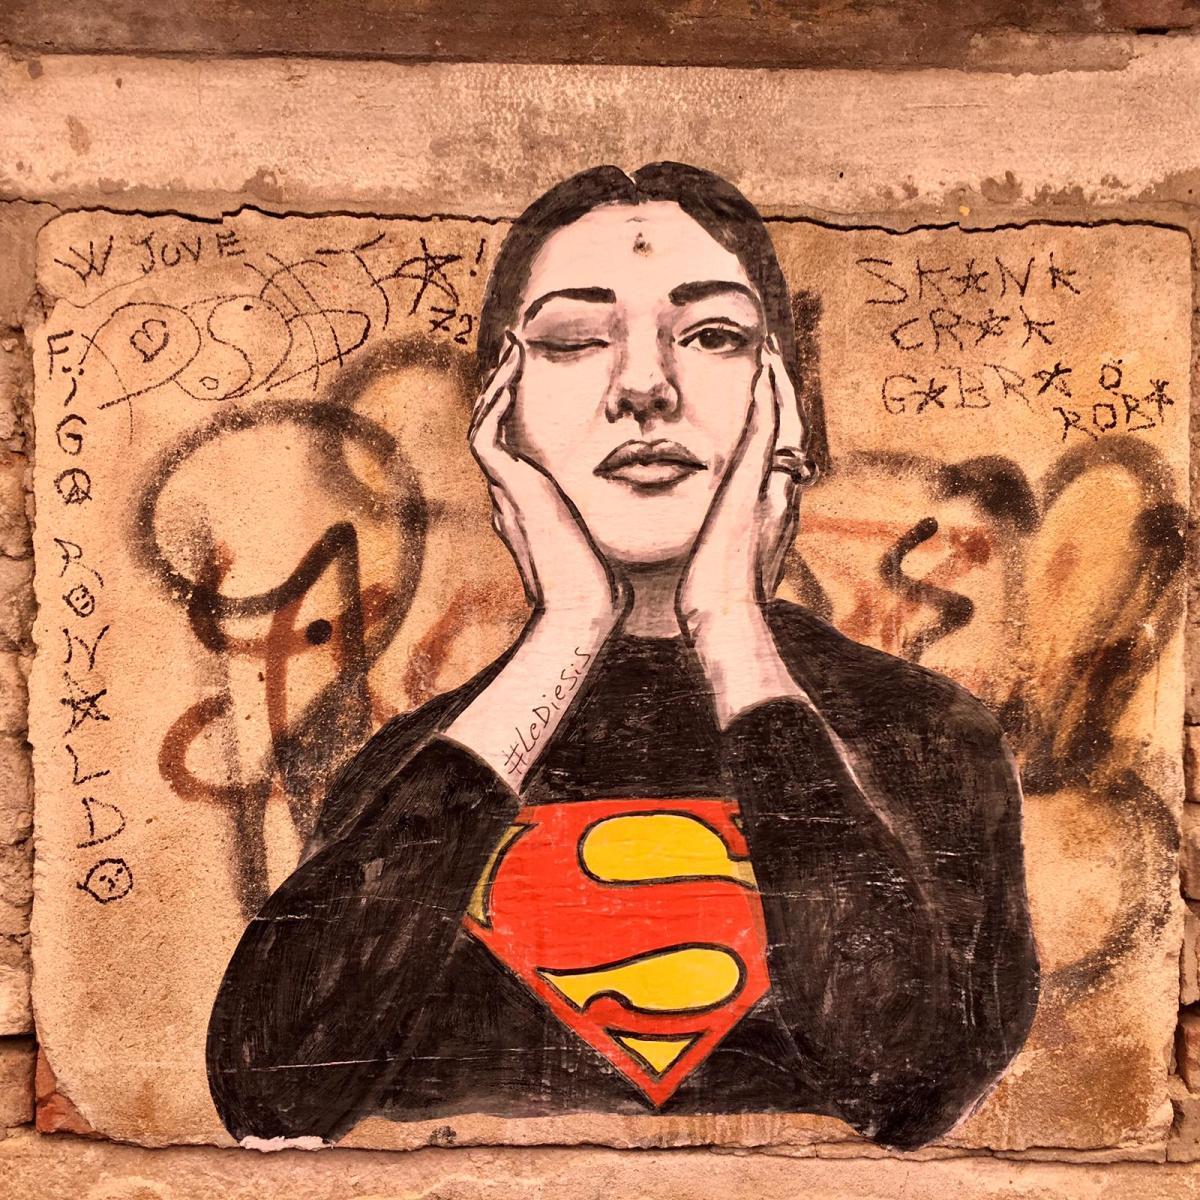 Graffiti of Woman in Venice